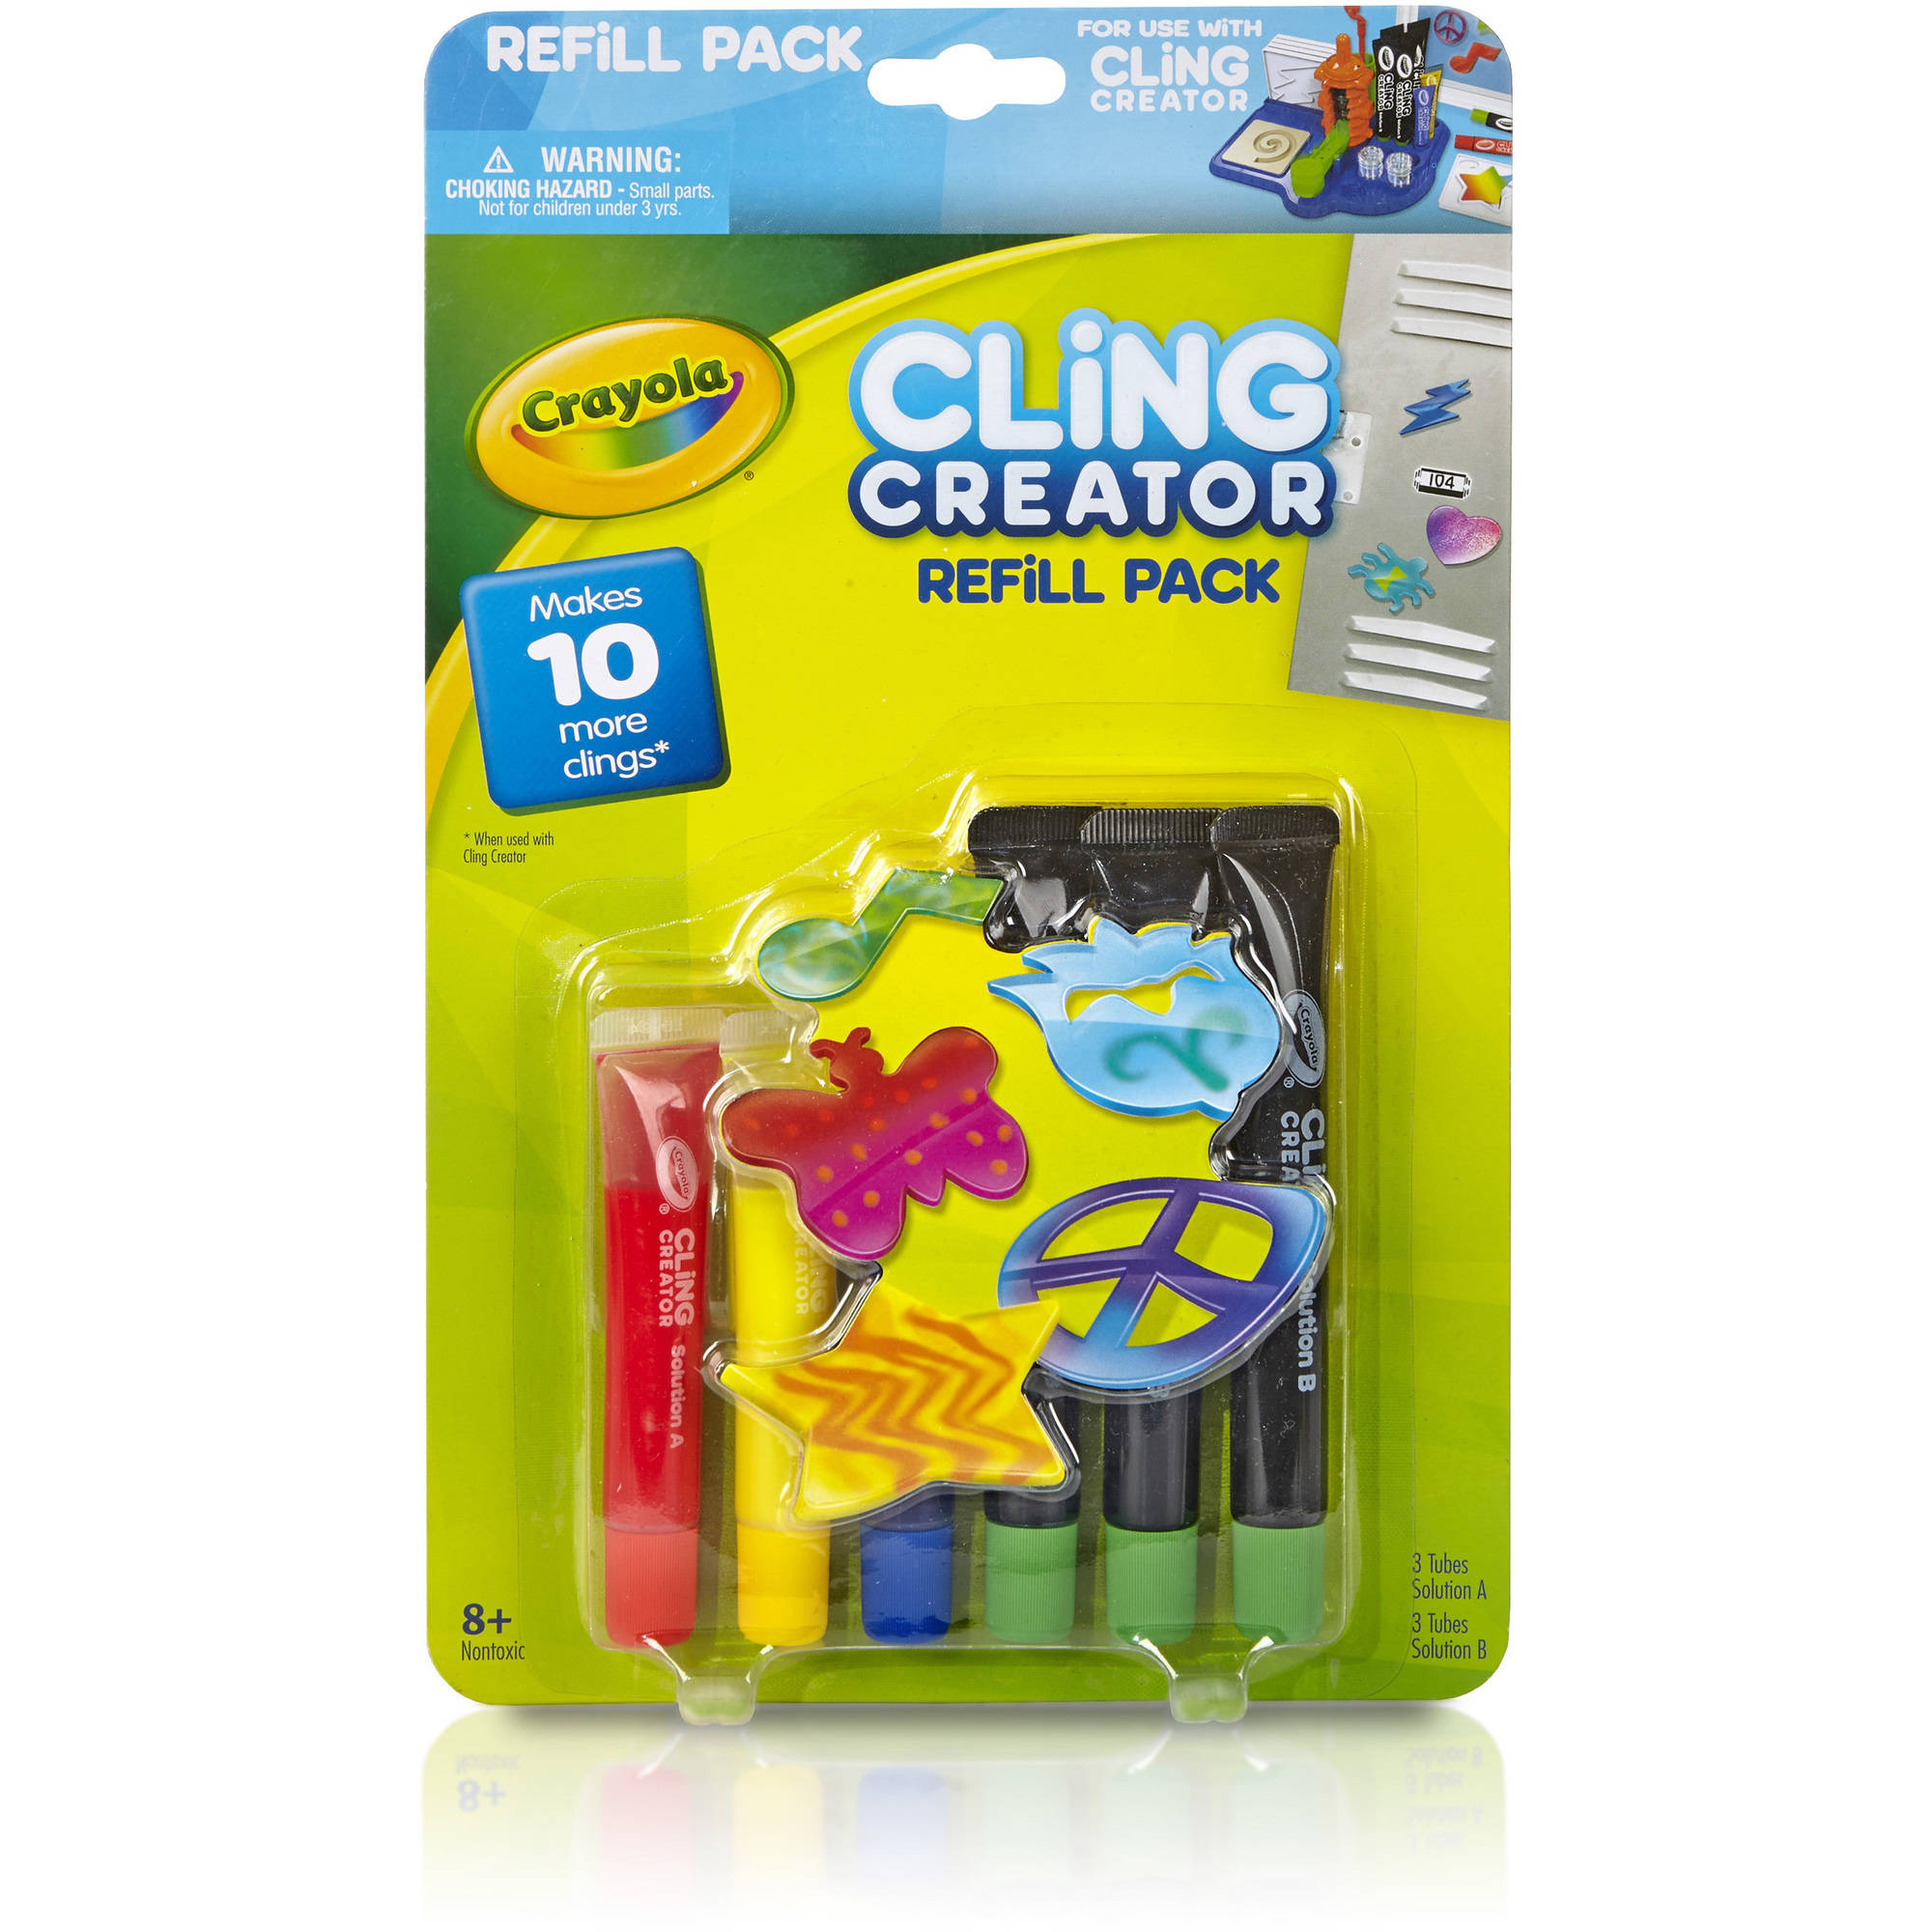 Crayola Cling Creator Refill